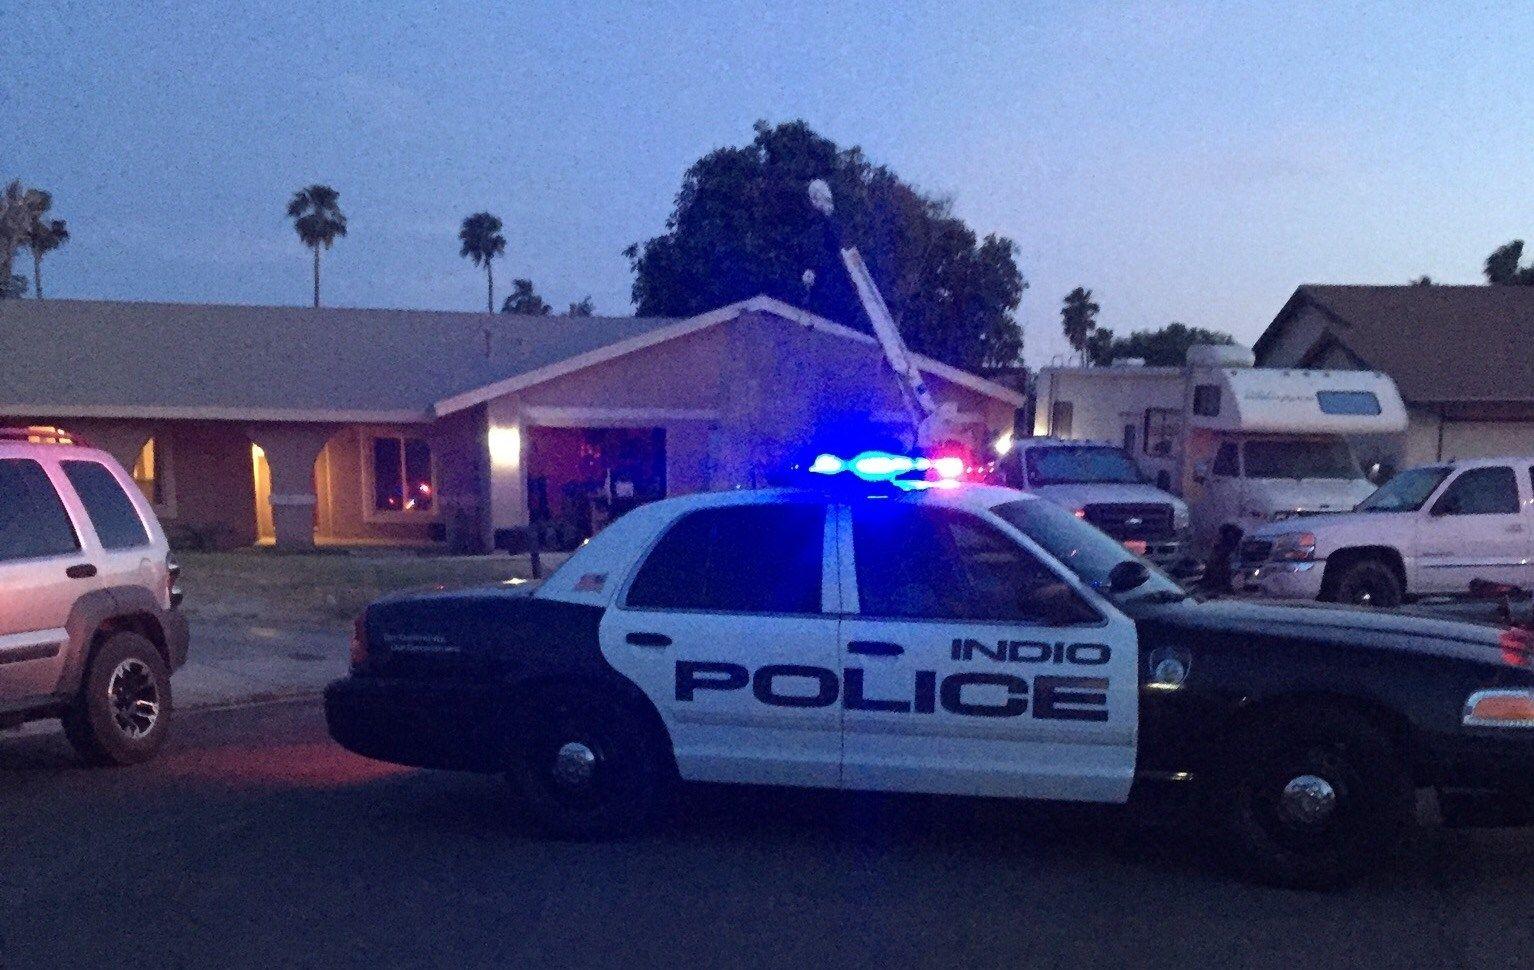 Man Found Shot in Parked Car in Indio